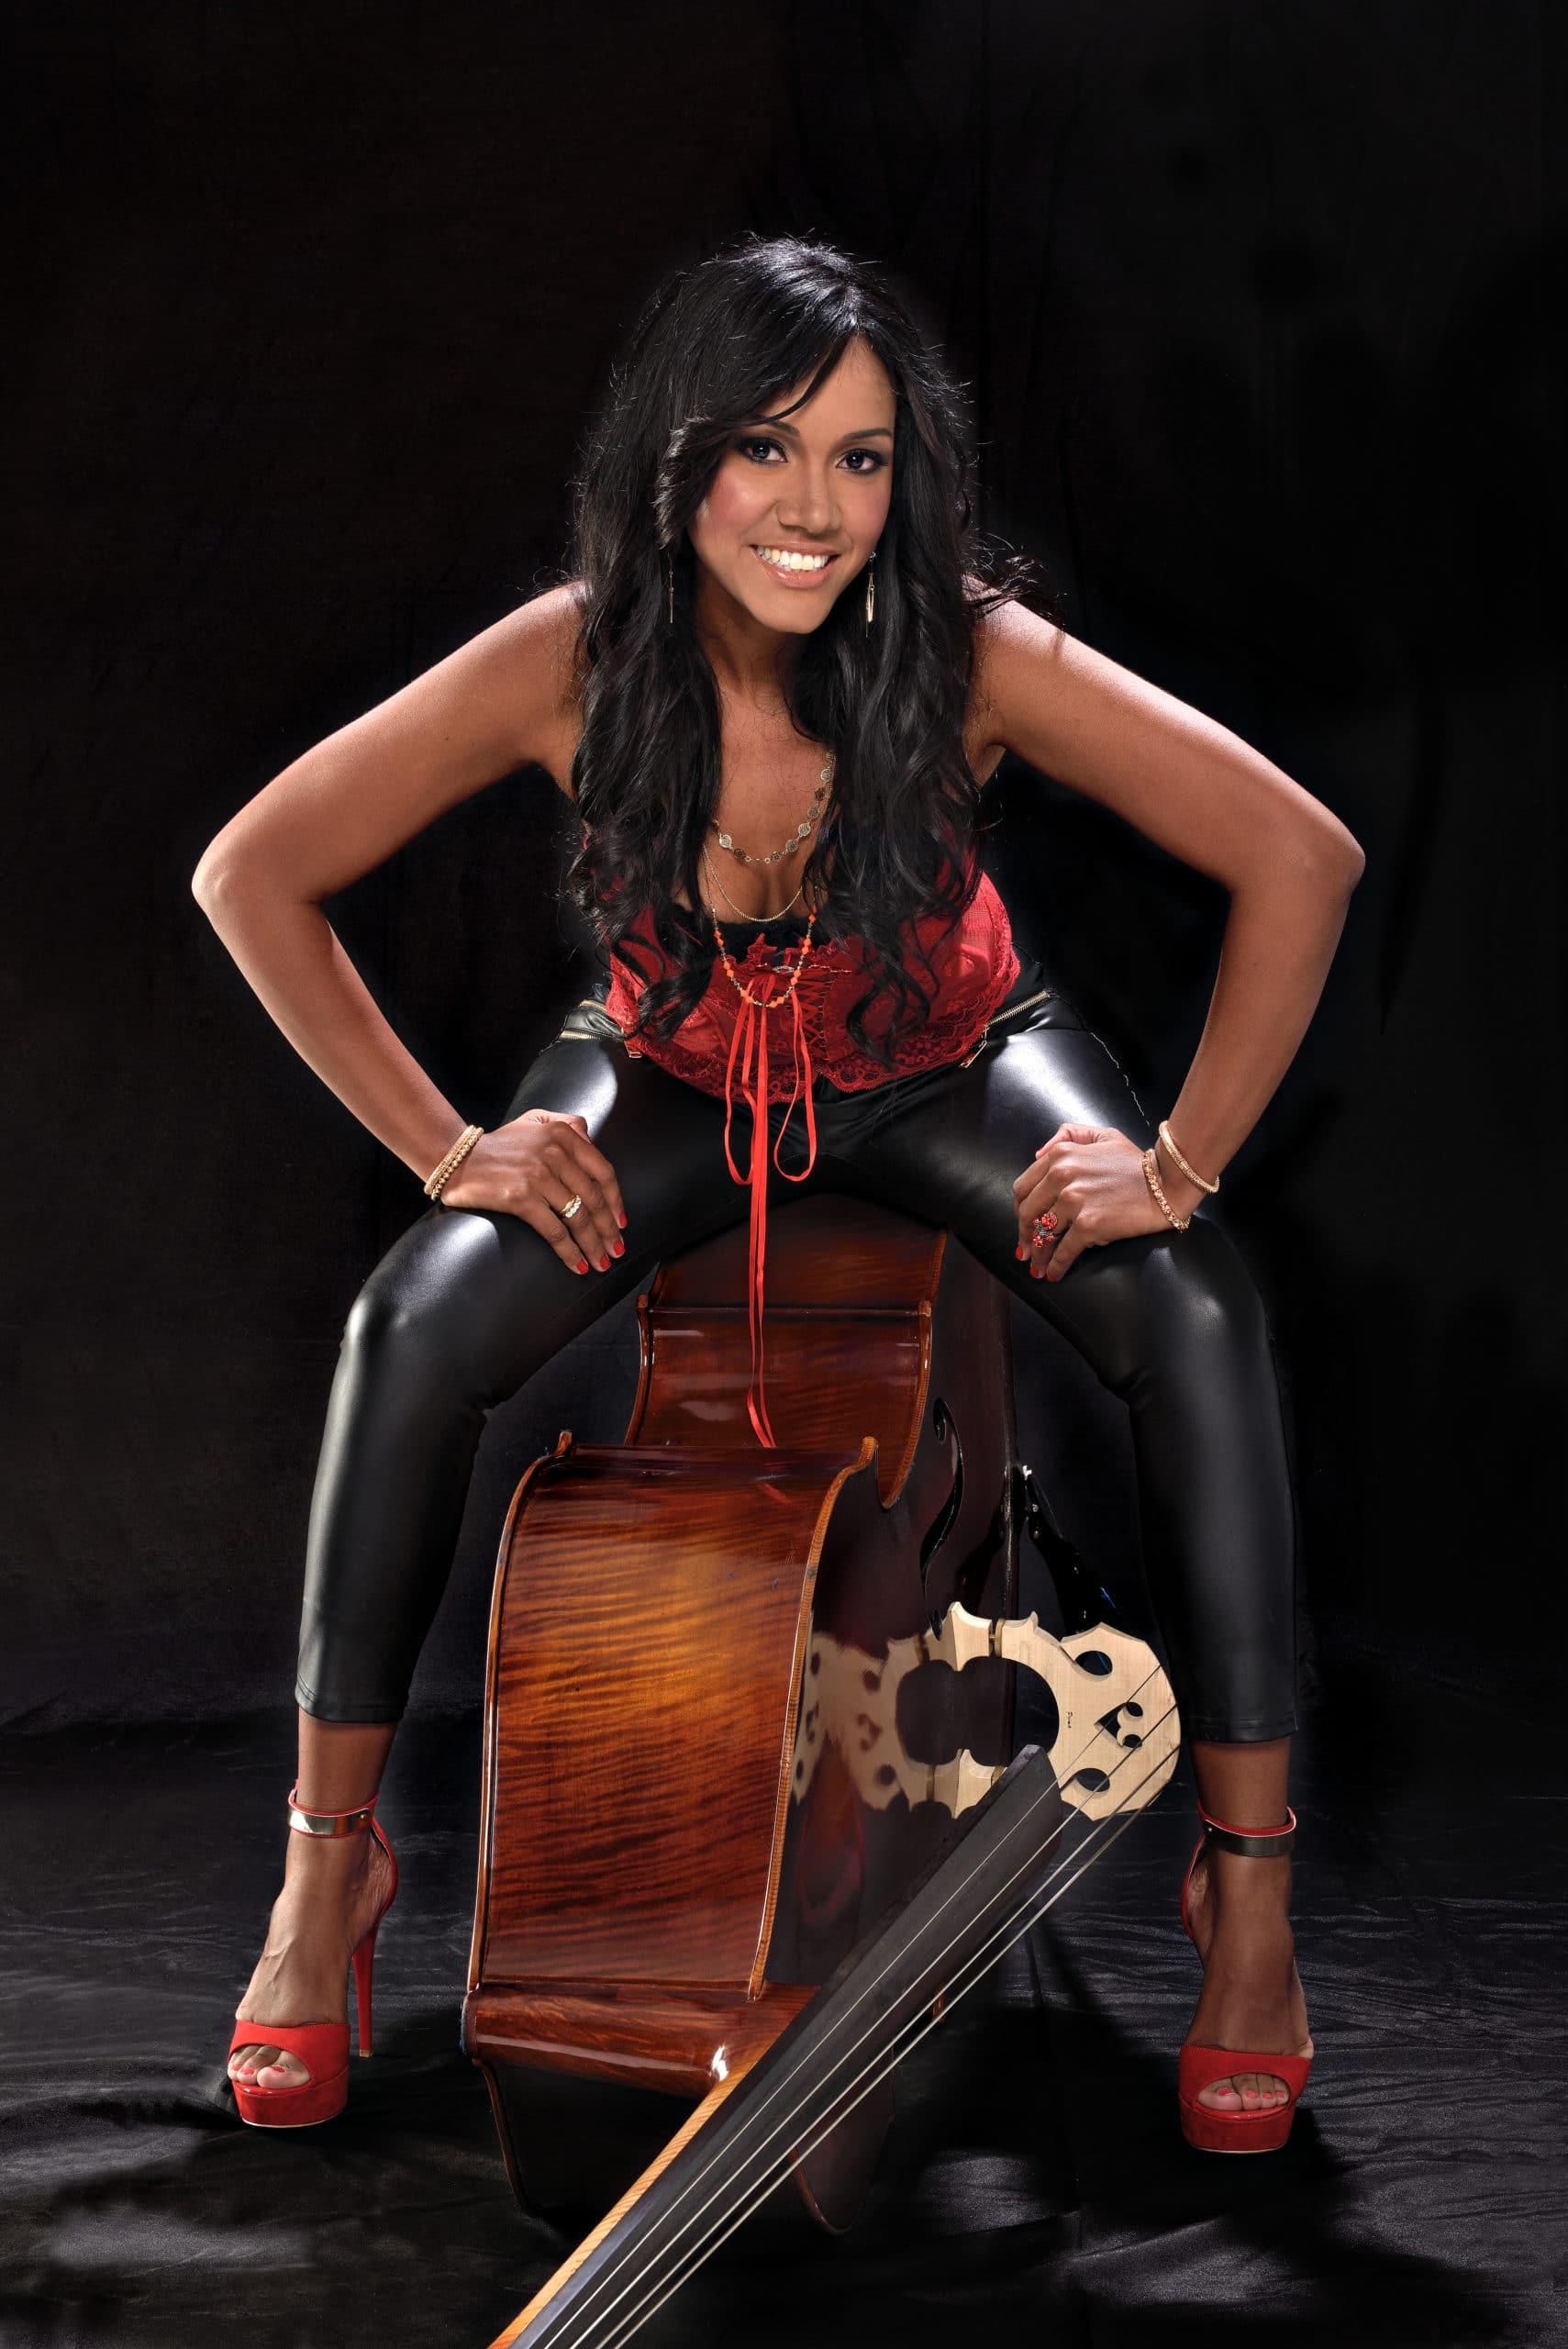 yuri betancourt bassista cantante cubana